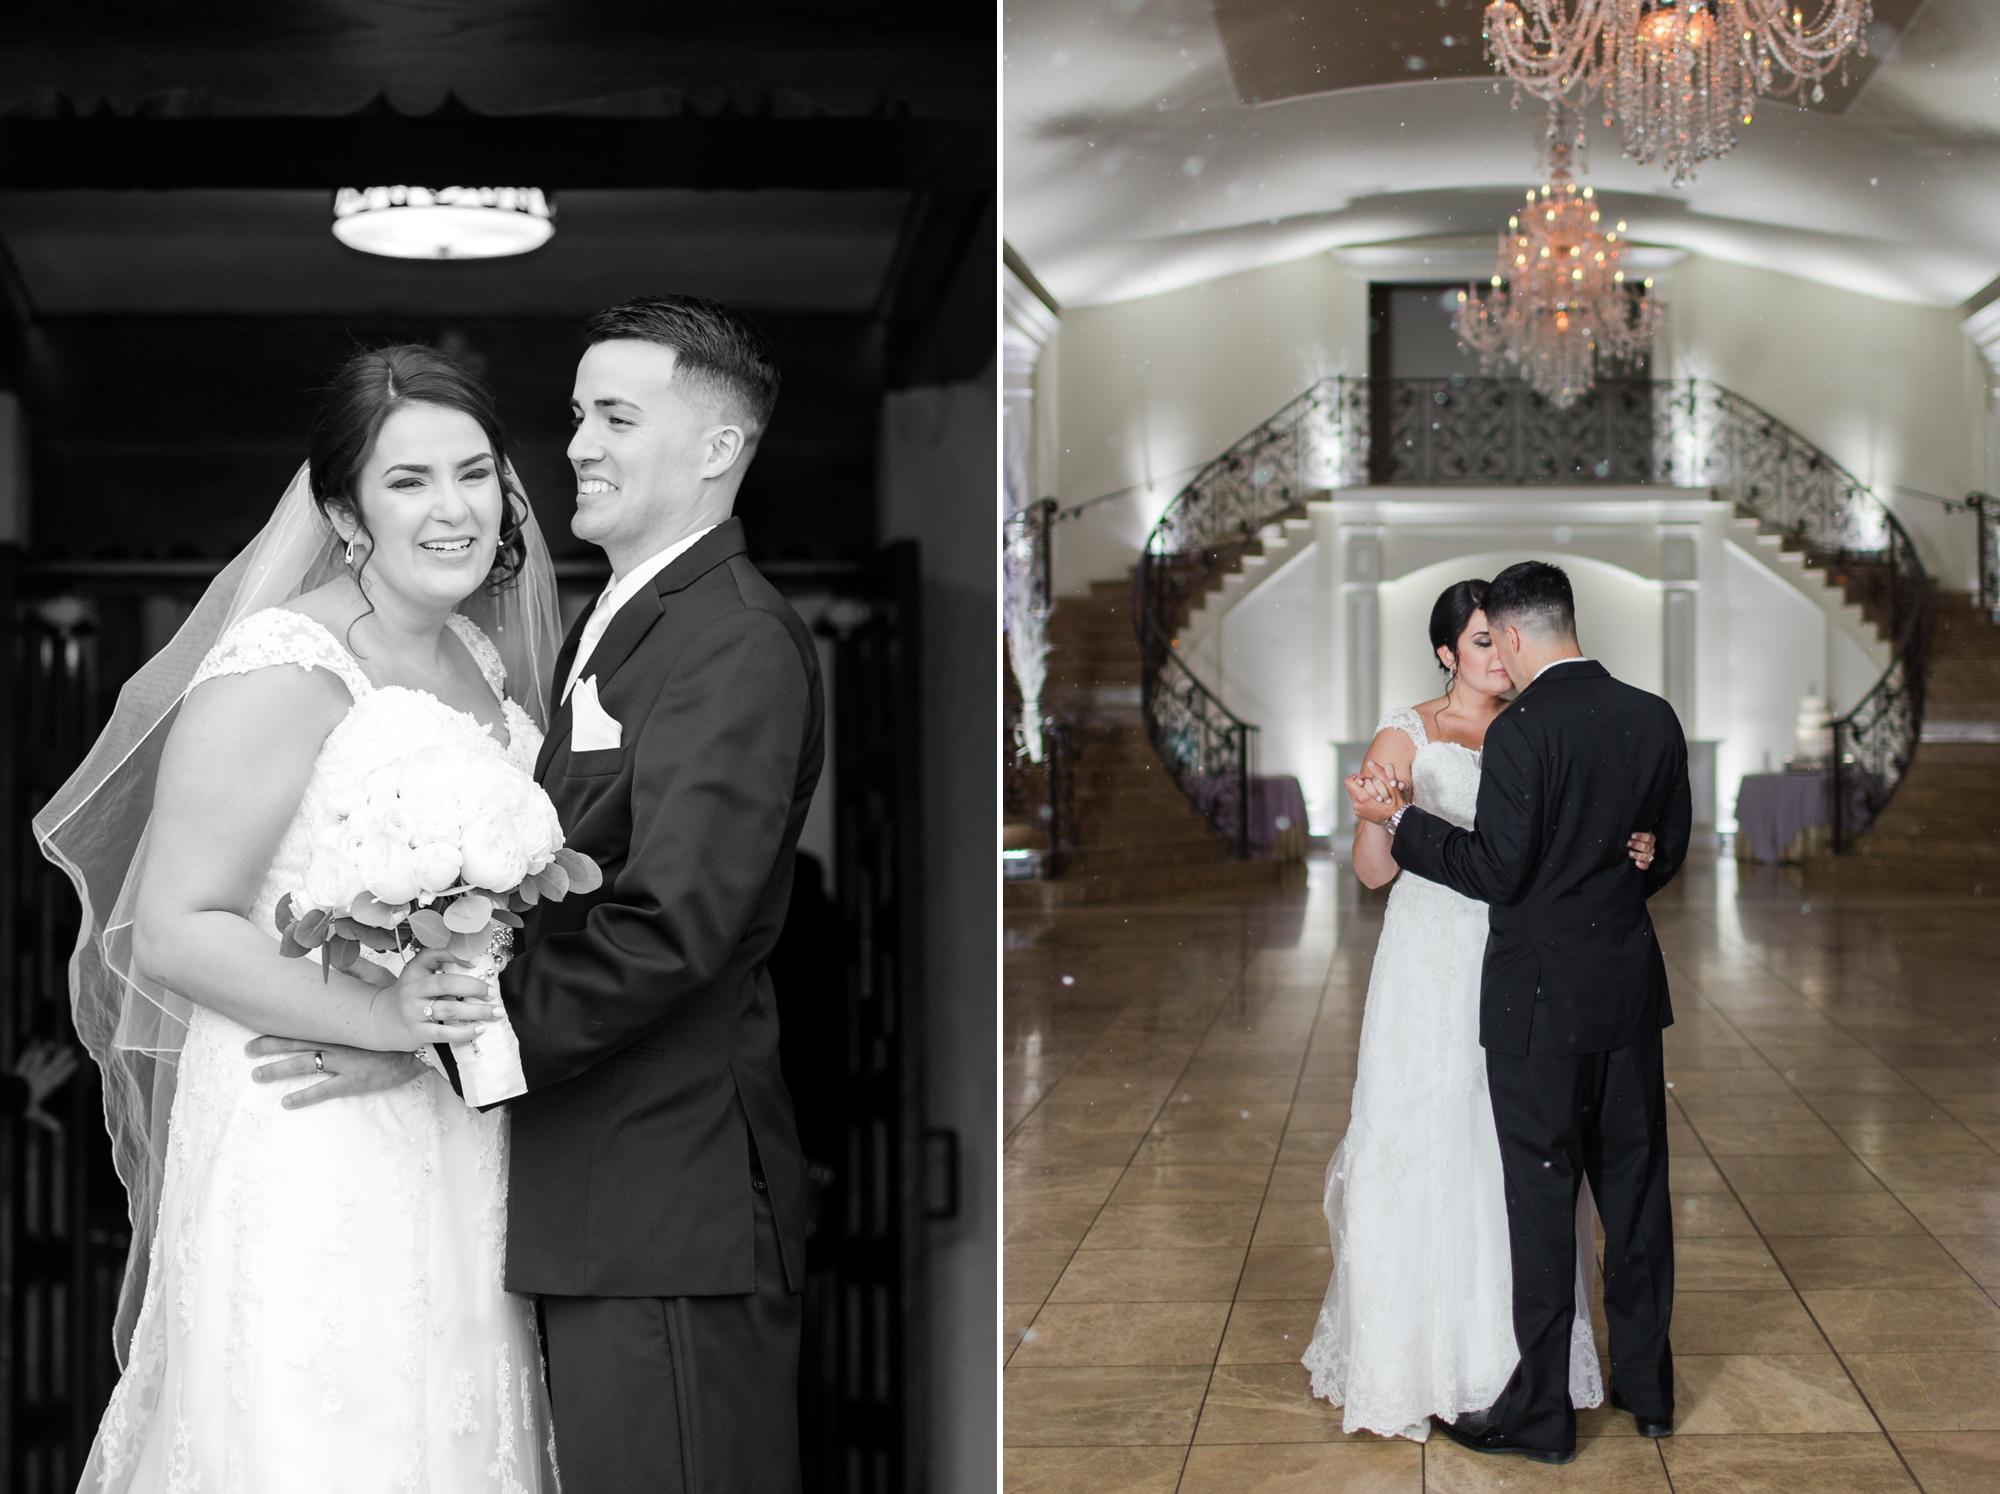 Best of 2016 | Prospect, CT Wedding at Aria Wedding + Banquet Facility | CT, NYC, New England + Destination Luxury Wedding + Engagement Photographer | Shaina Lee Photography